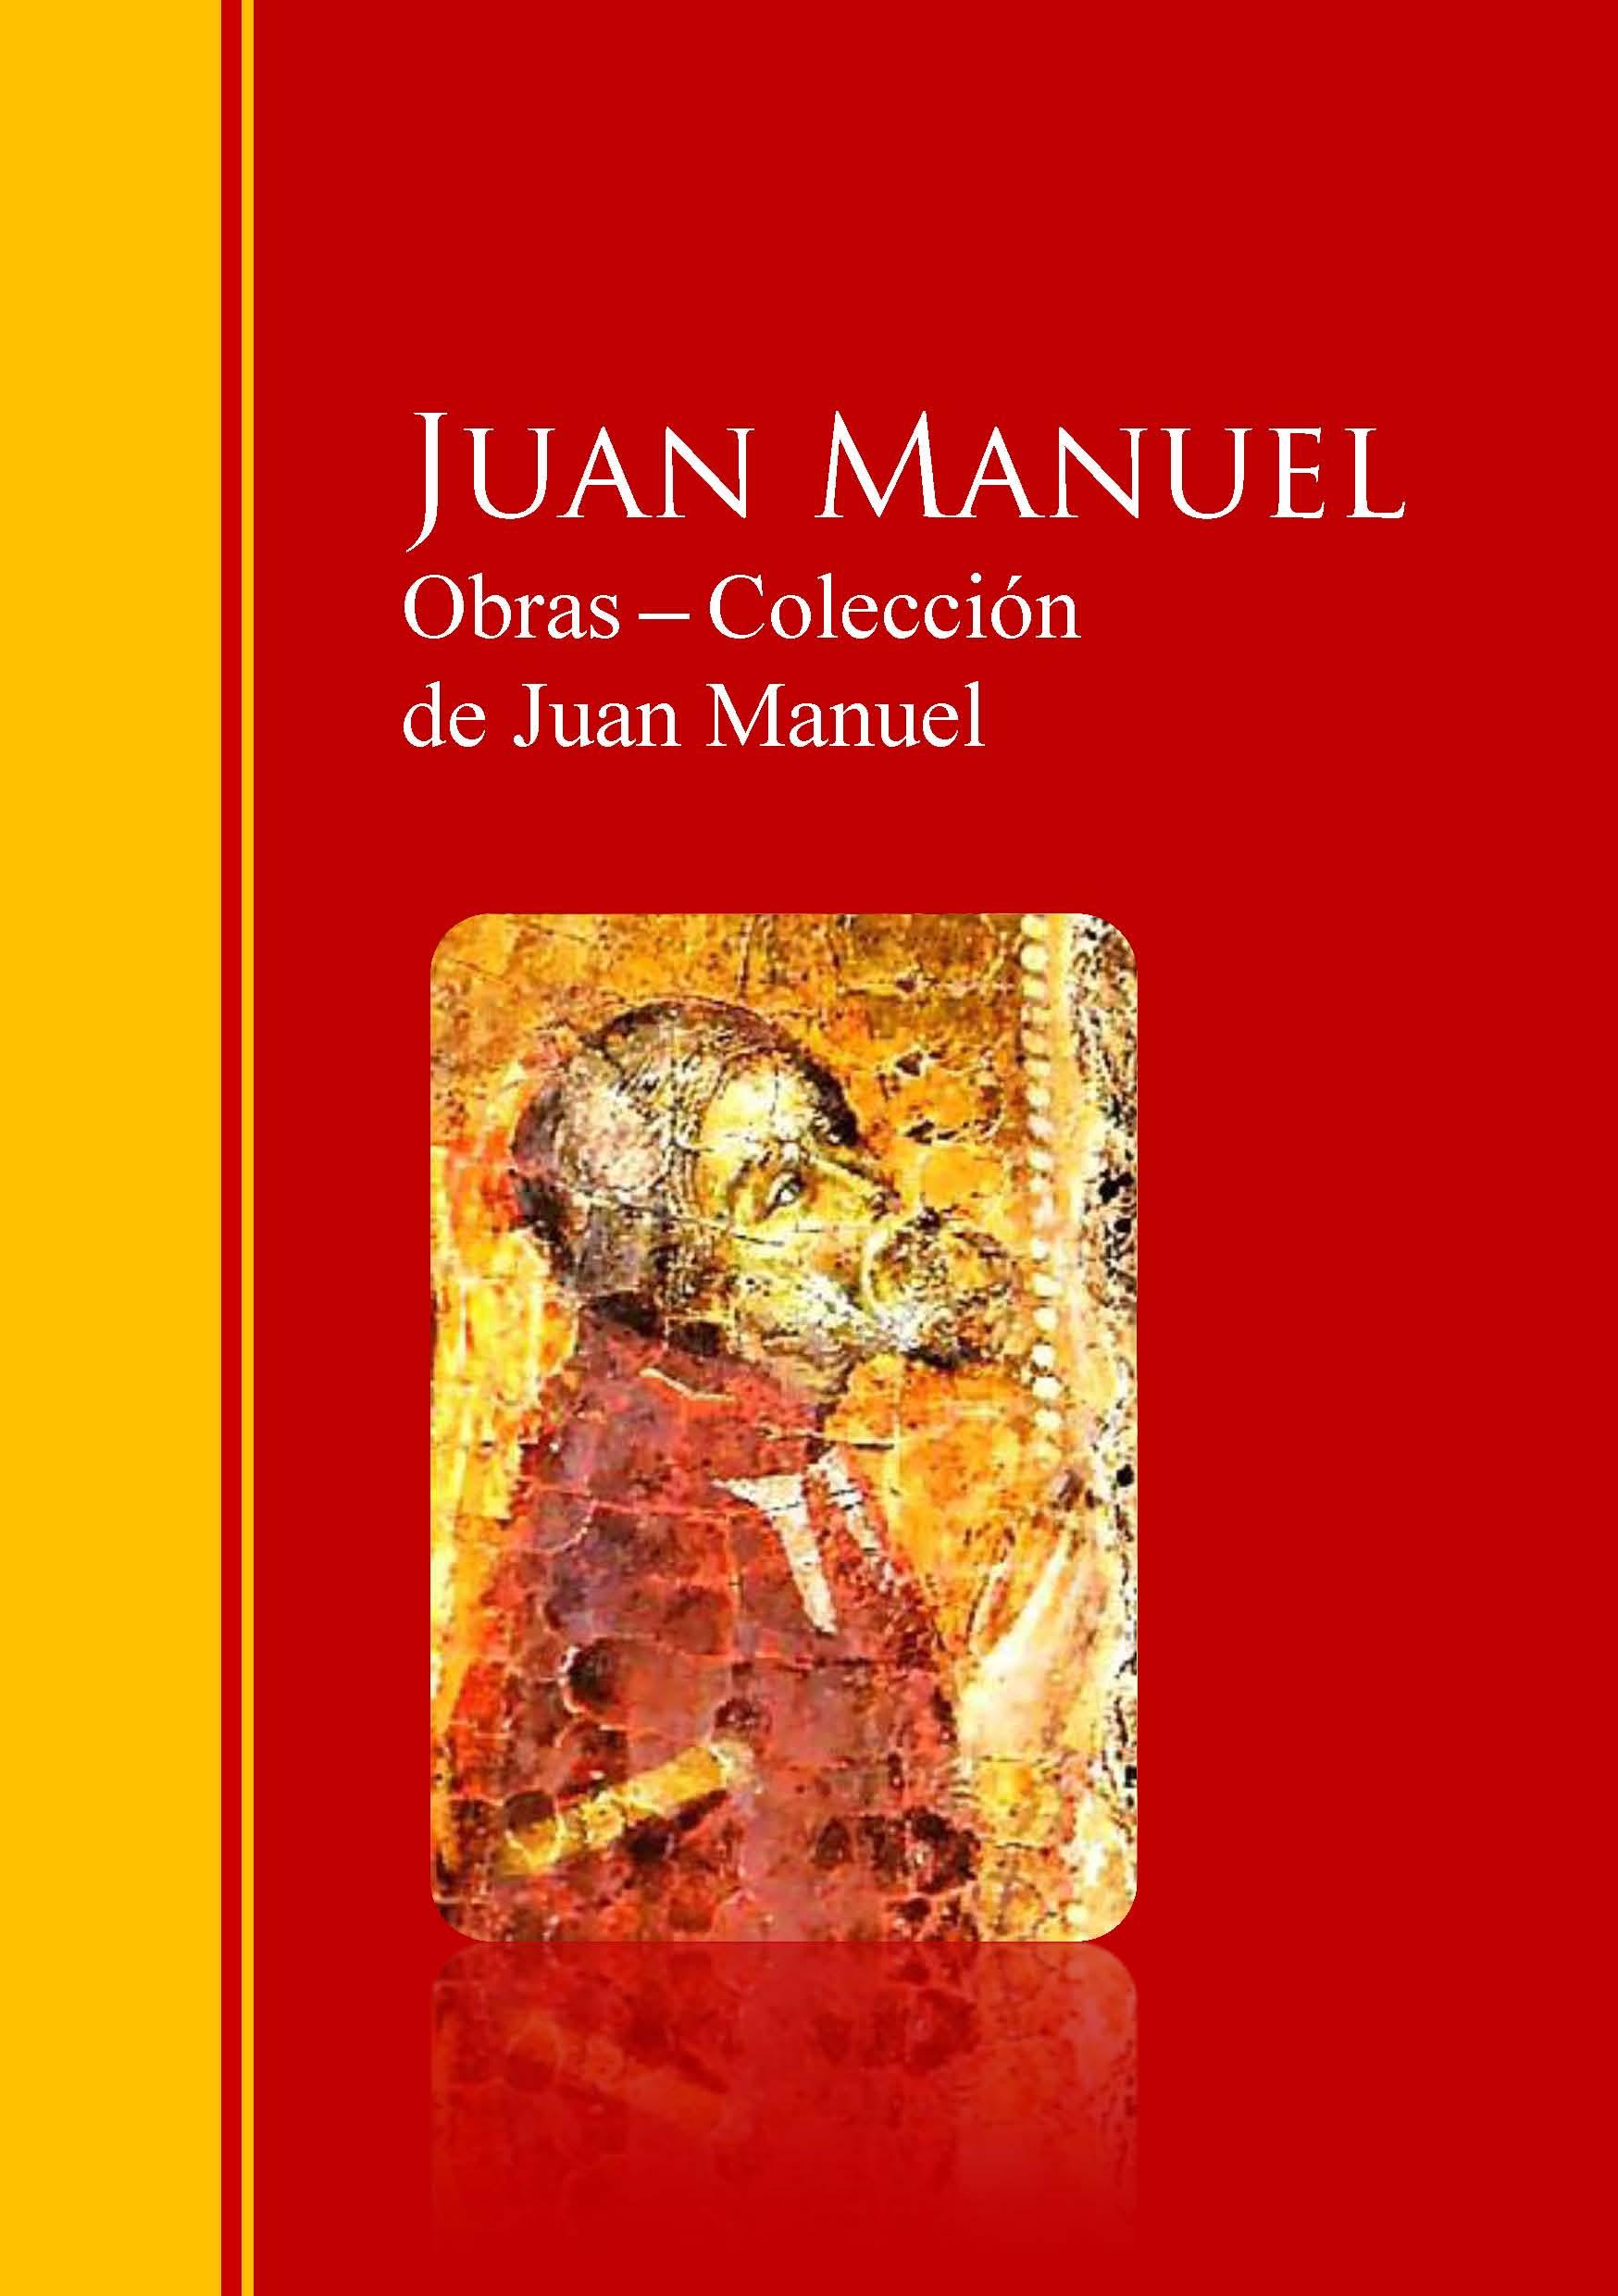 Juan Manuel Obras ─ Colección de Juan Manuel: El Conde Lucanor juan manuel marcos gunteri talv